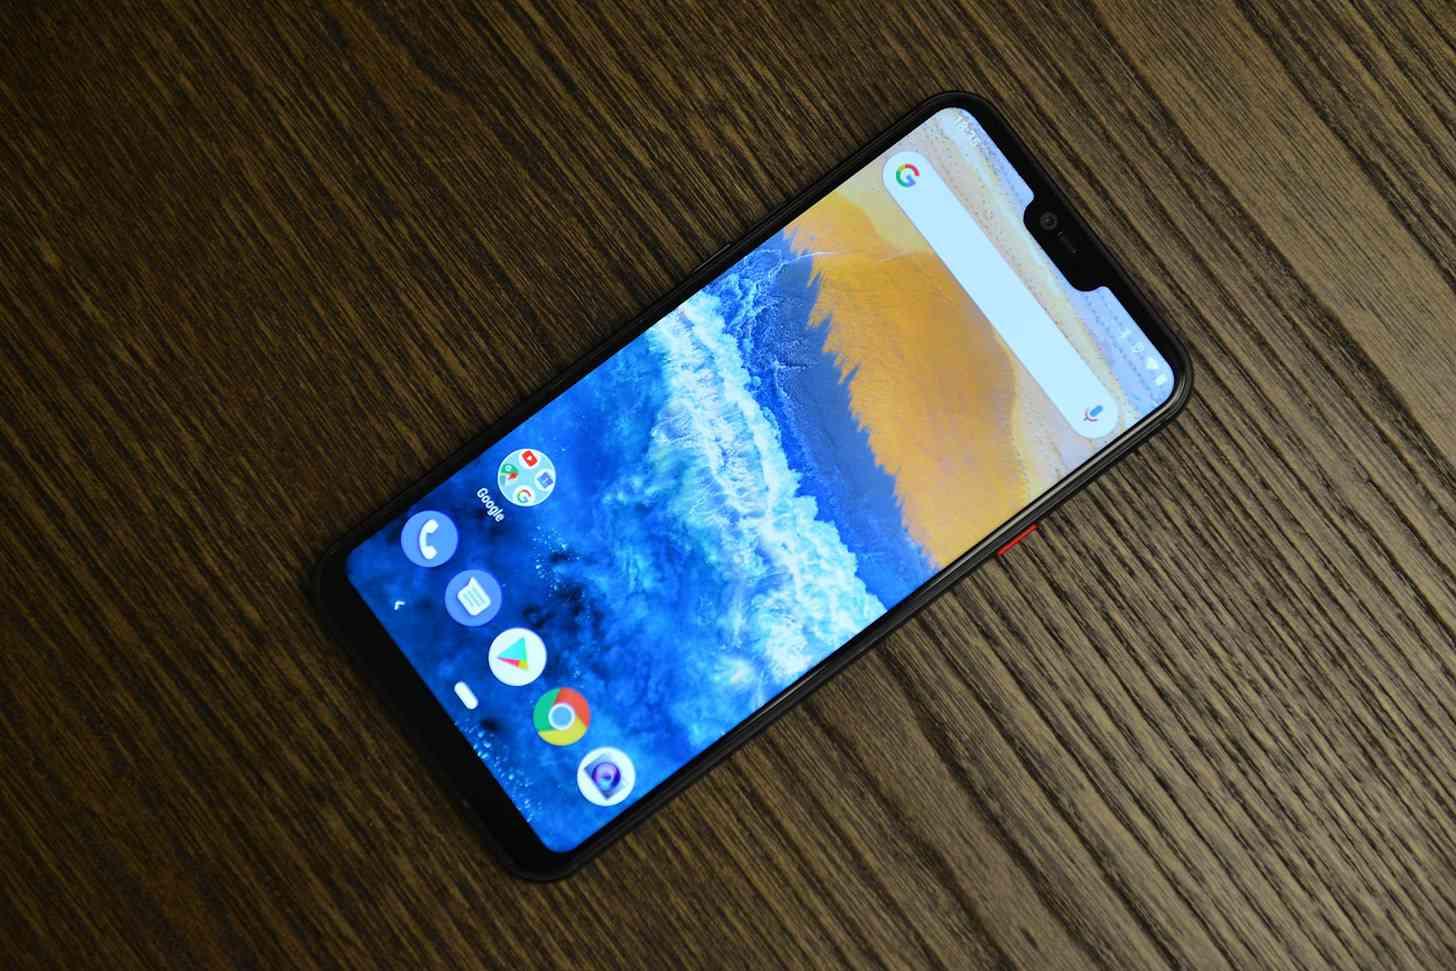 Teracube smartphone